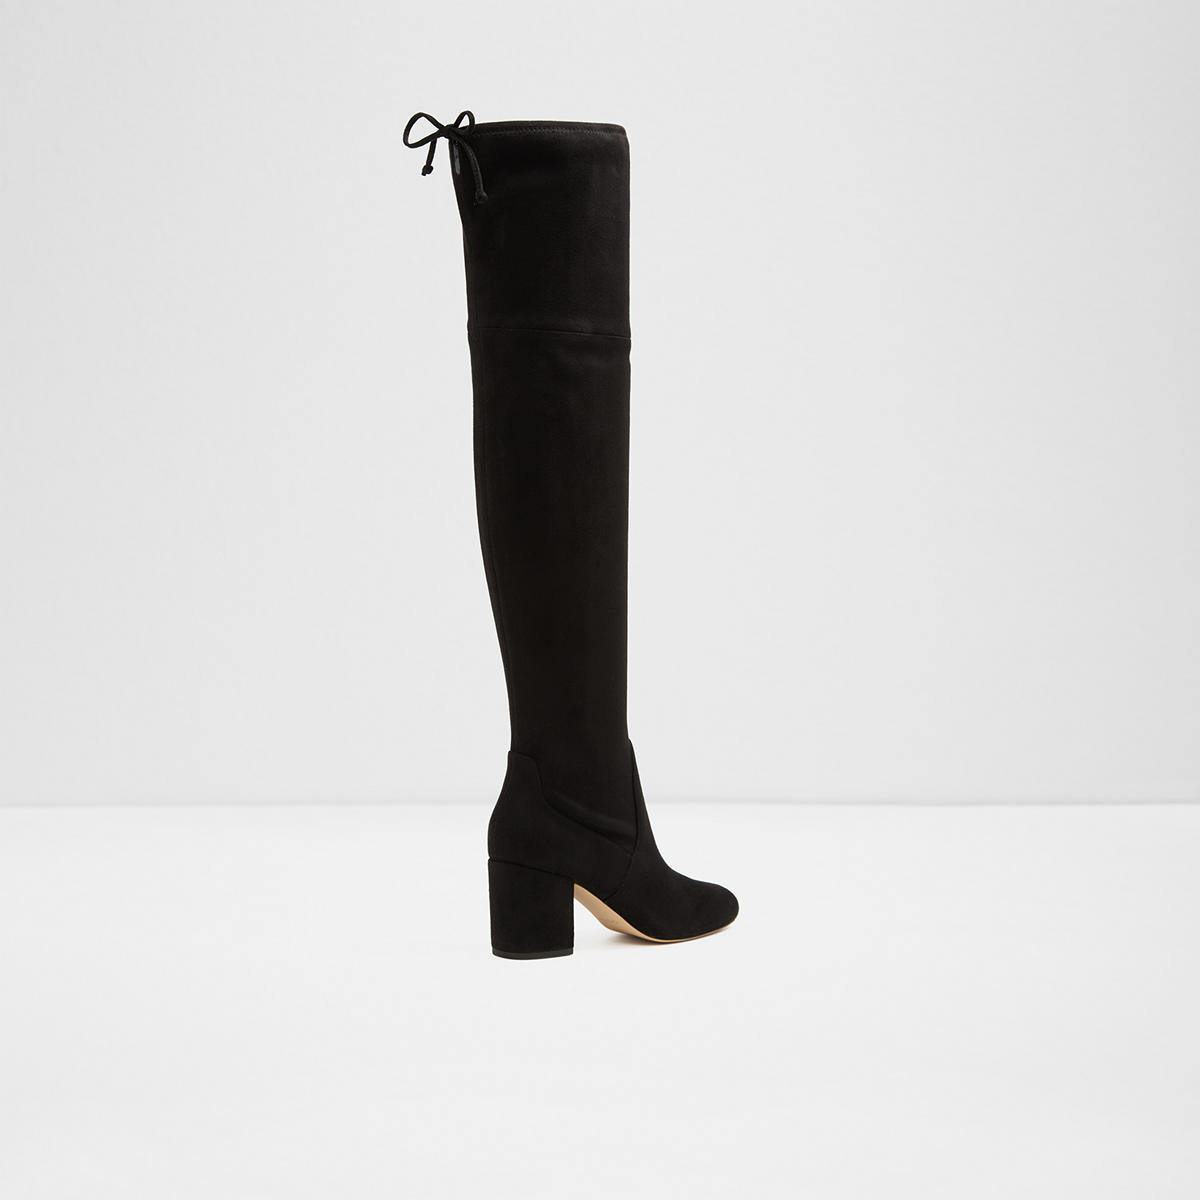 Boots Midnight Black Rollyra Women's Us q7vwTHt